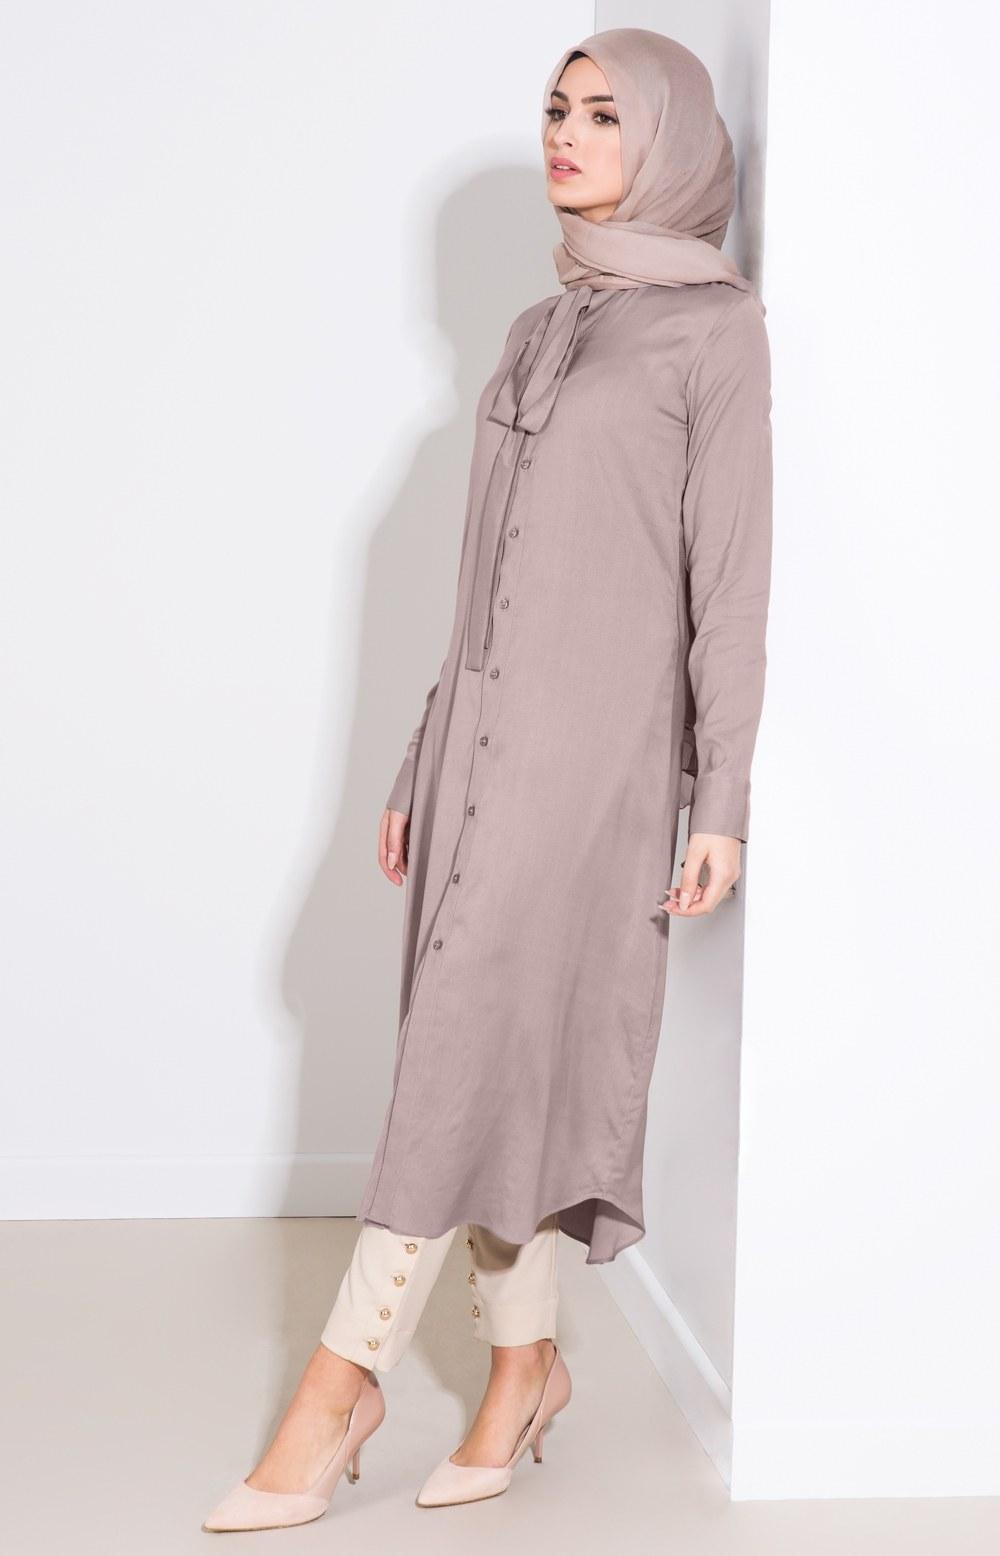 Inspirasi Model Baju Lebaran Zwdg 25 Trend Model Baju Muslim Lebaran 2018 Simple & Modis